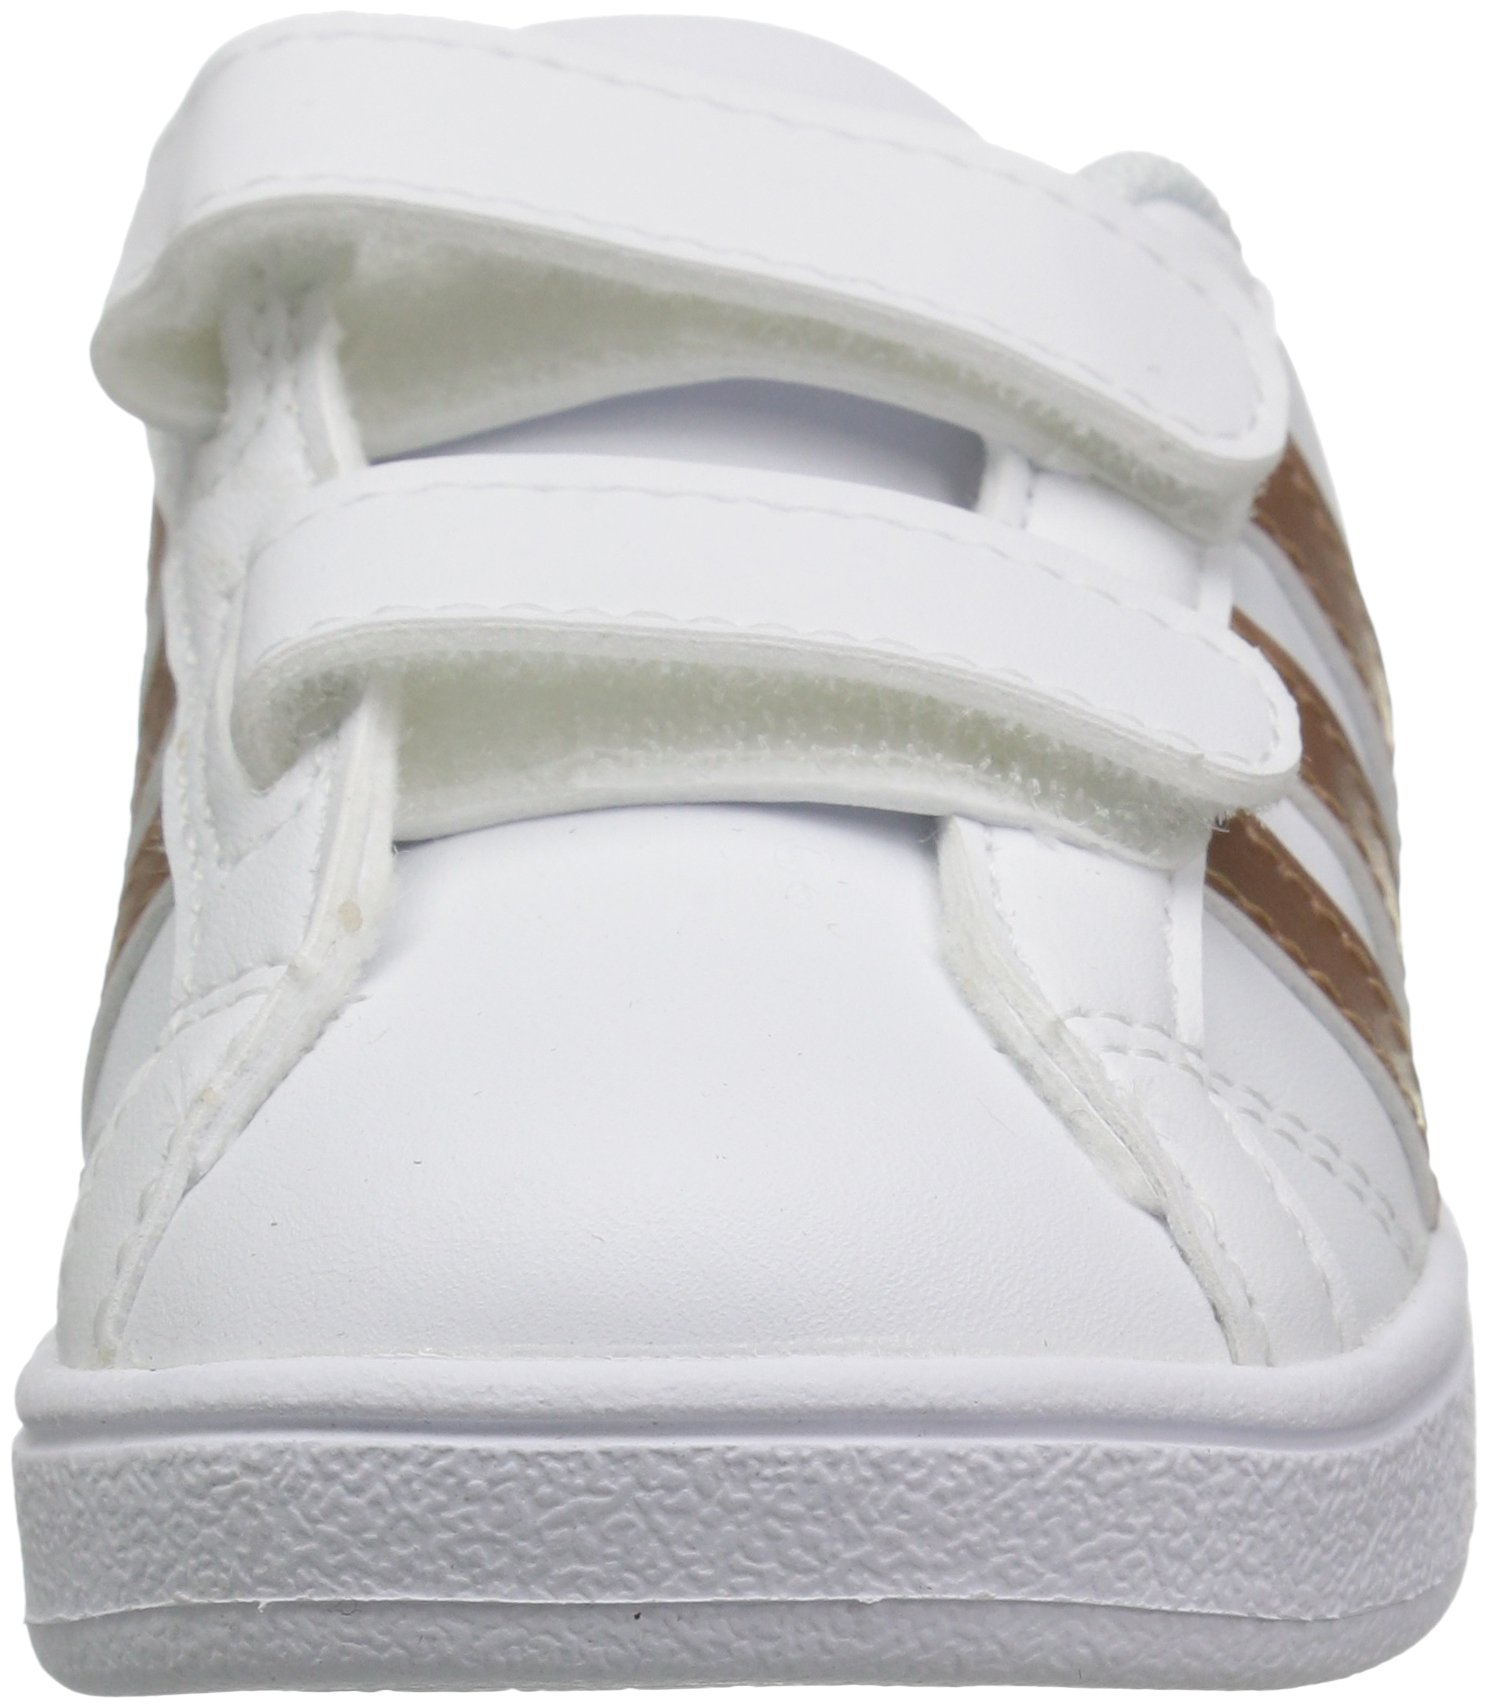 adidas Performance Baby Baseline, White/Copper Metallic/Black, 6K M US Toddler by adidas (Image #4)